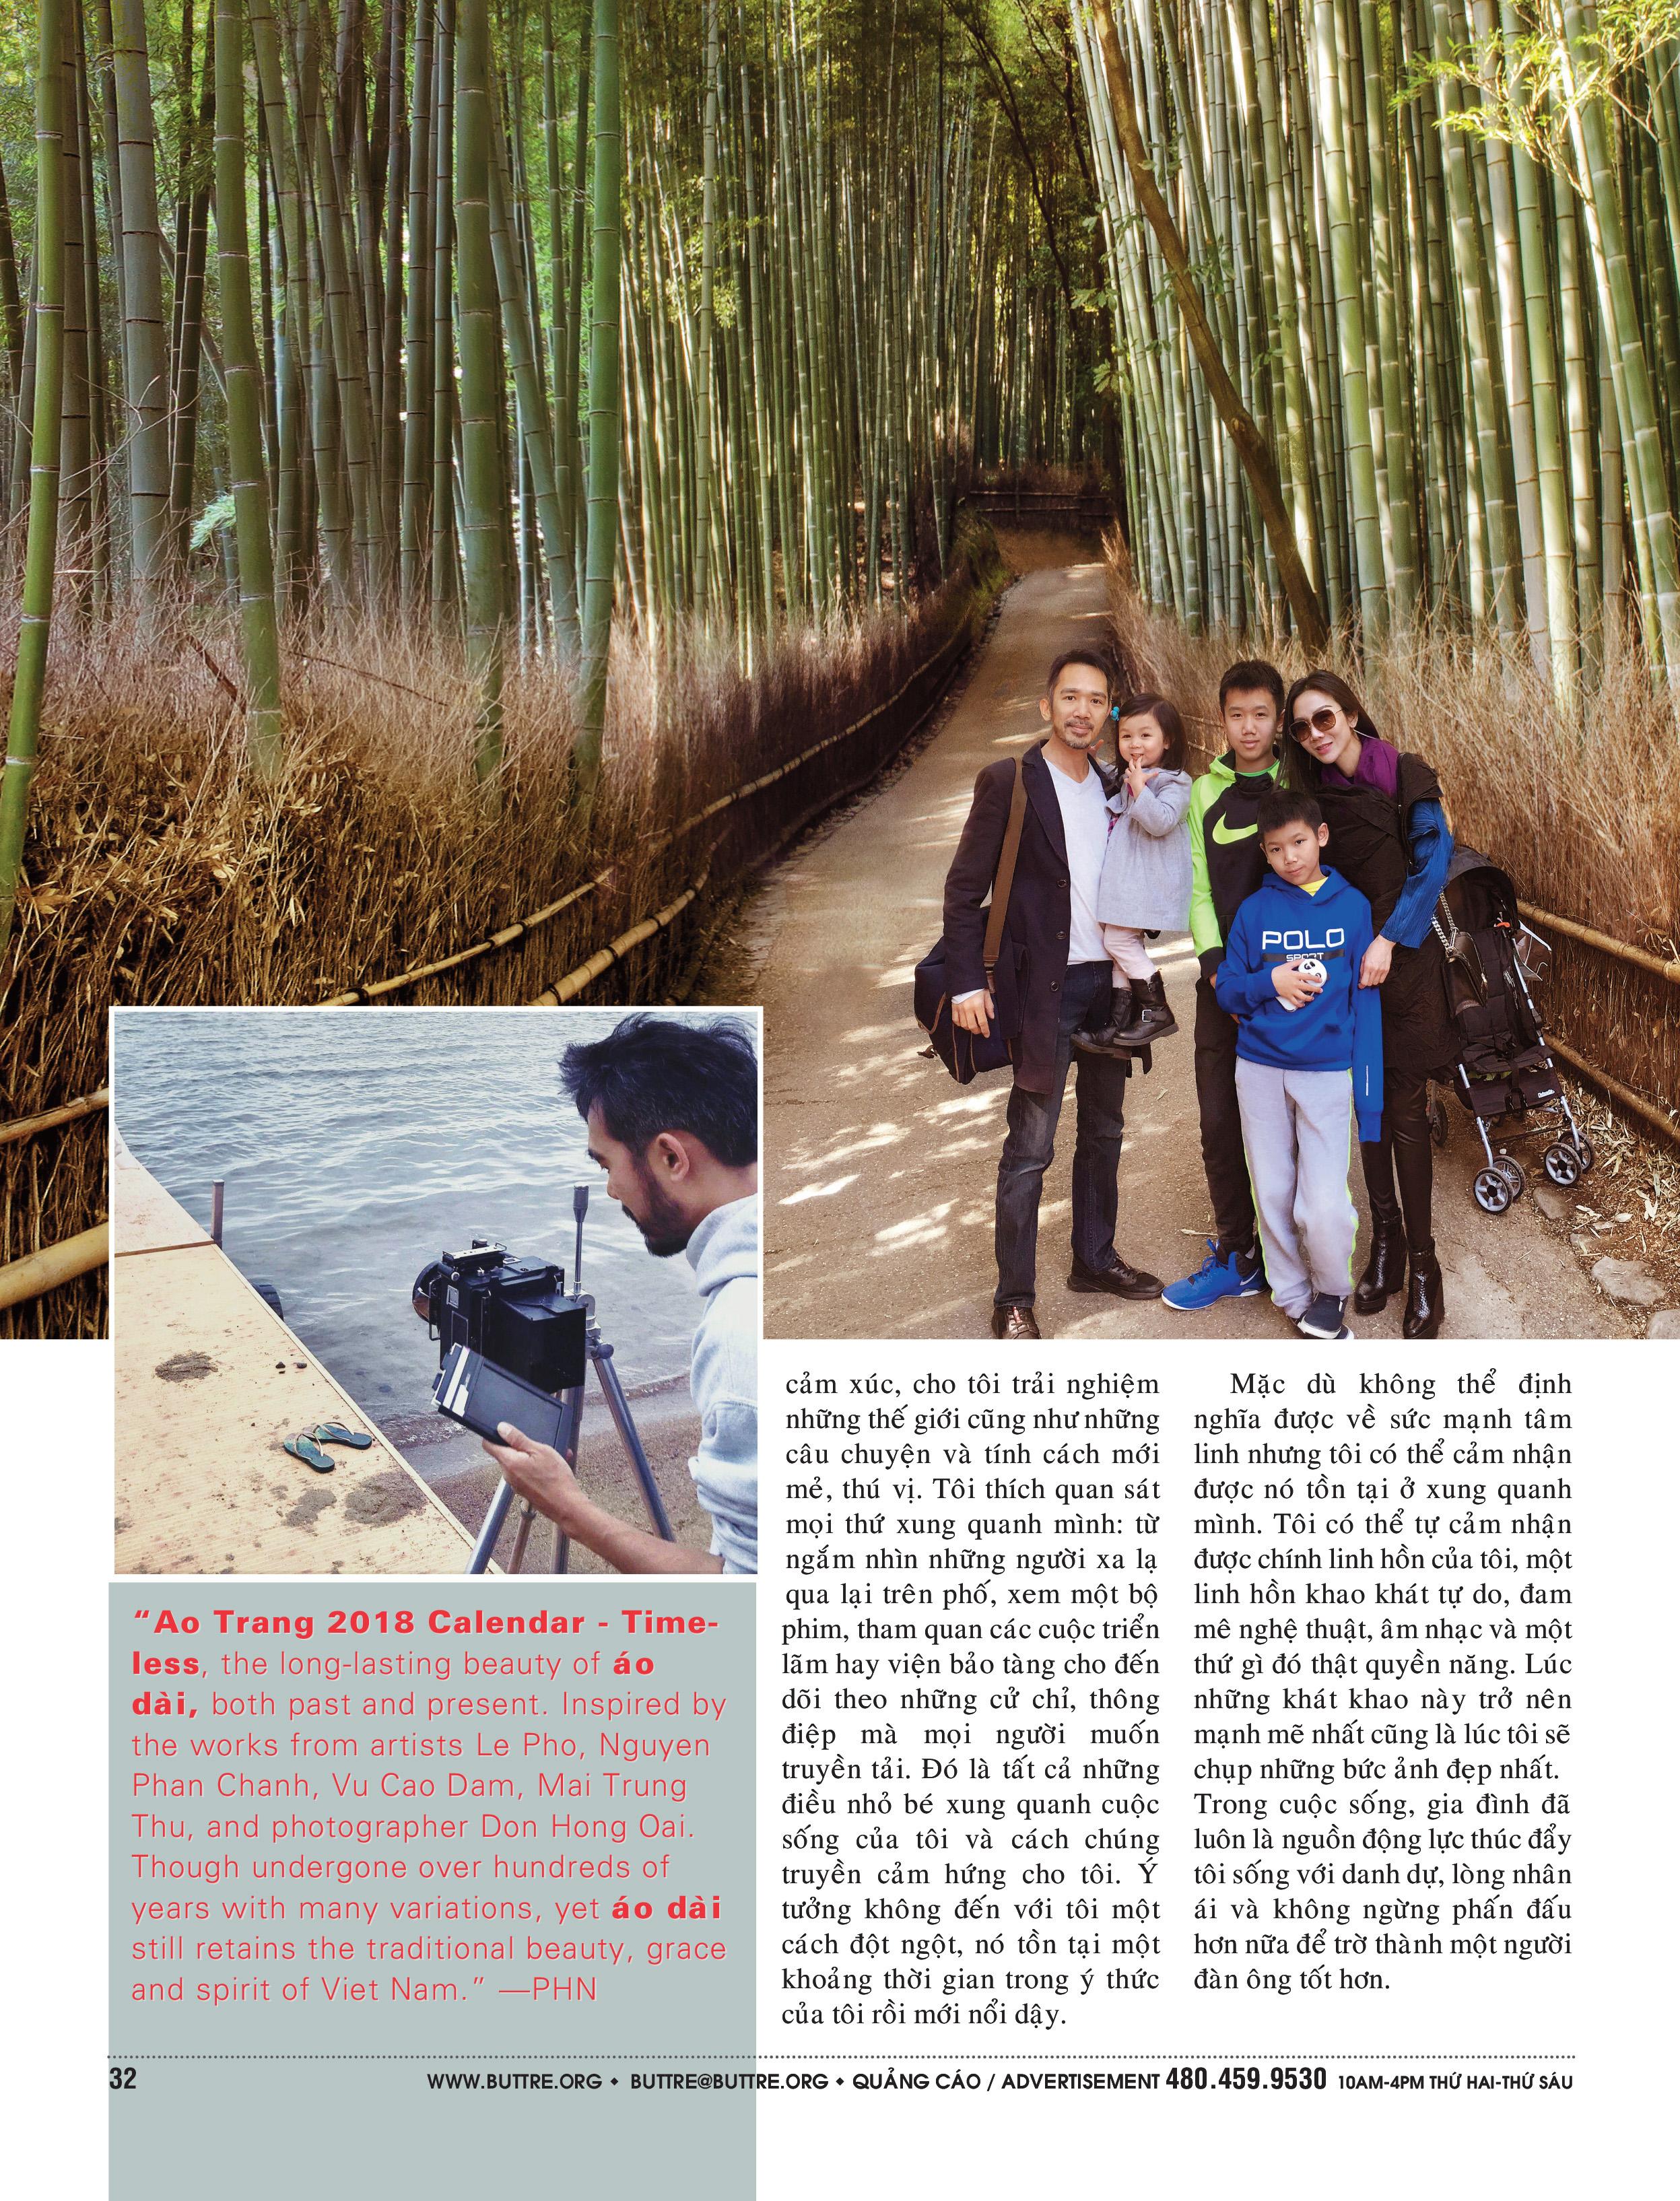 Pham-Hoai-Nam-But-Tre-Interview March 2018-6.jpg